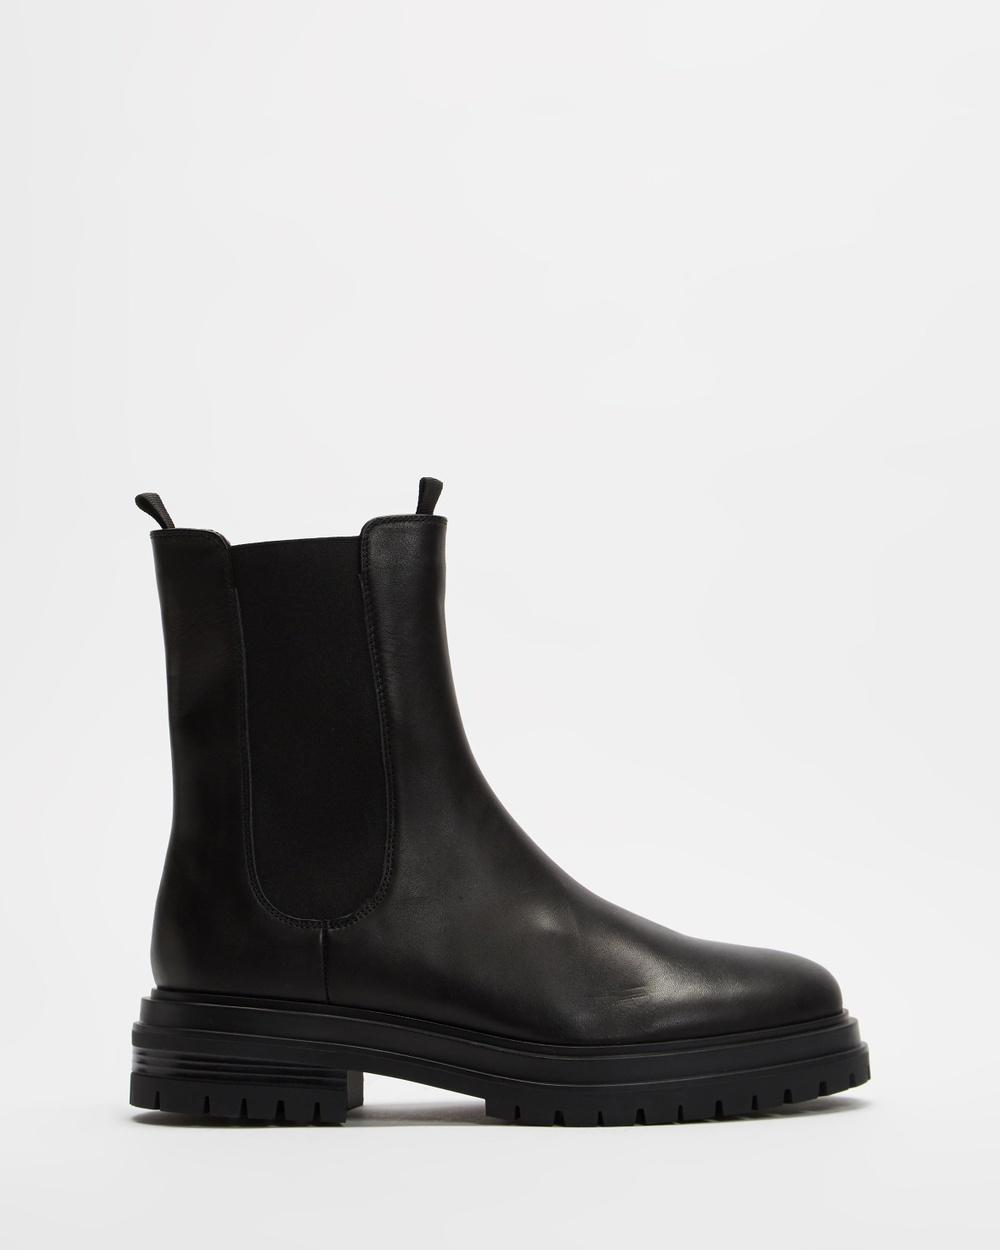 Tony Bianco Wolfe Boots Black Como Australia